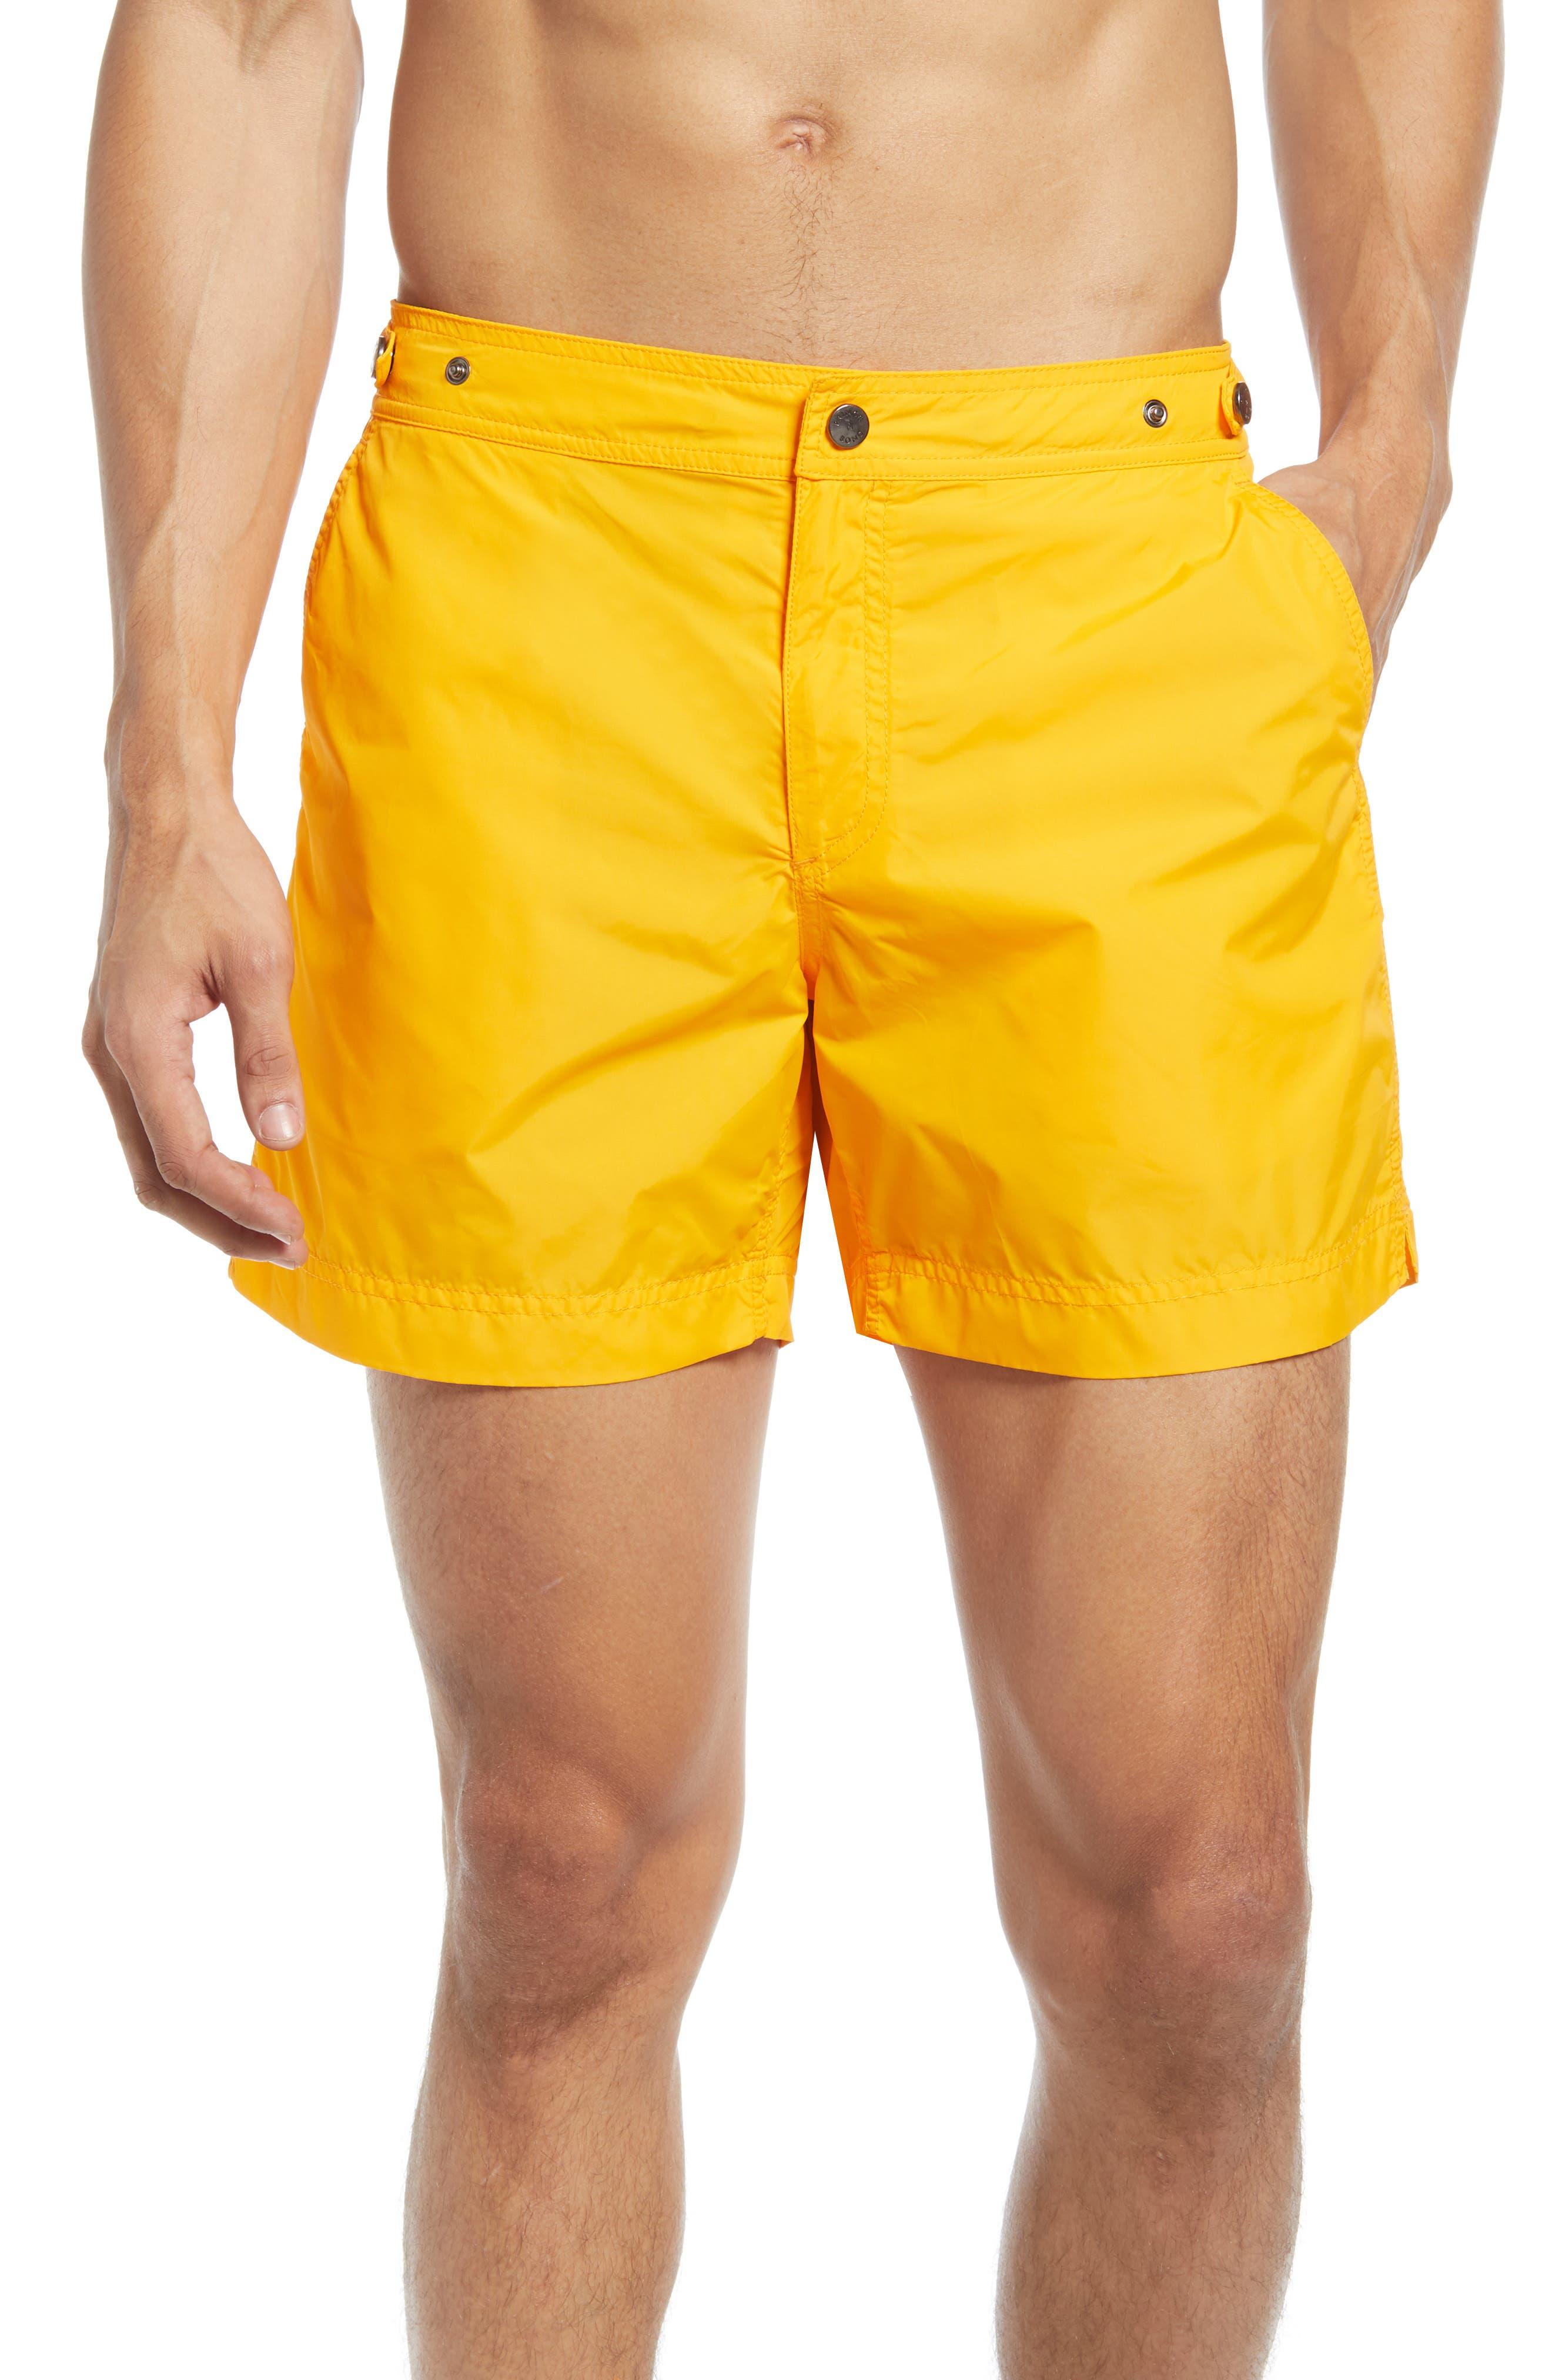 Vintage Men's Swimsuits – 1930s, 1940s, 1950s History Mens Prince  Bond Golden Hour Solid Hybrid Nylon Swim Trunks Size 34 - Yellow $145.00 AT vintagedancer.com